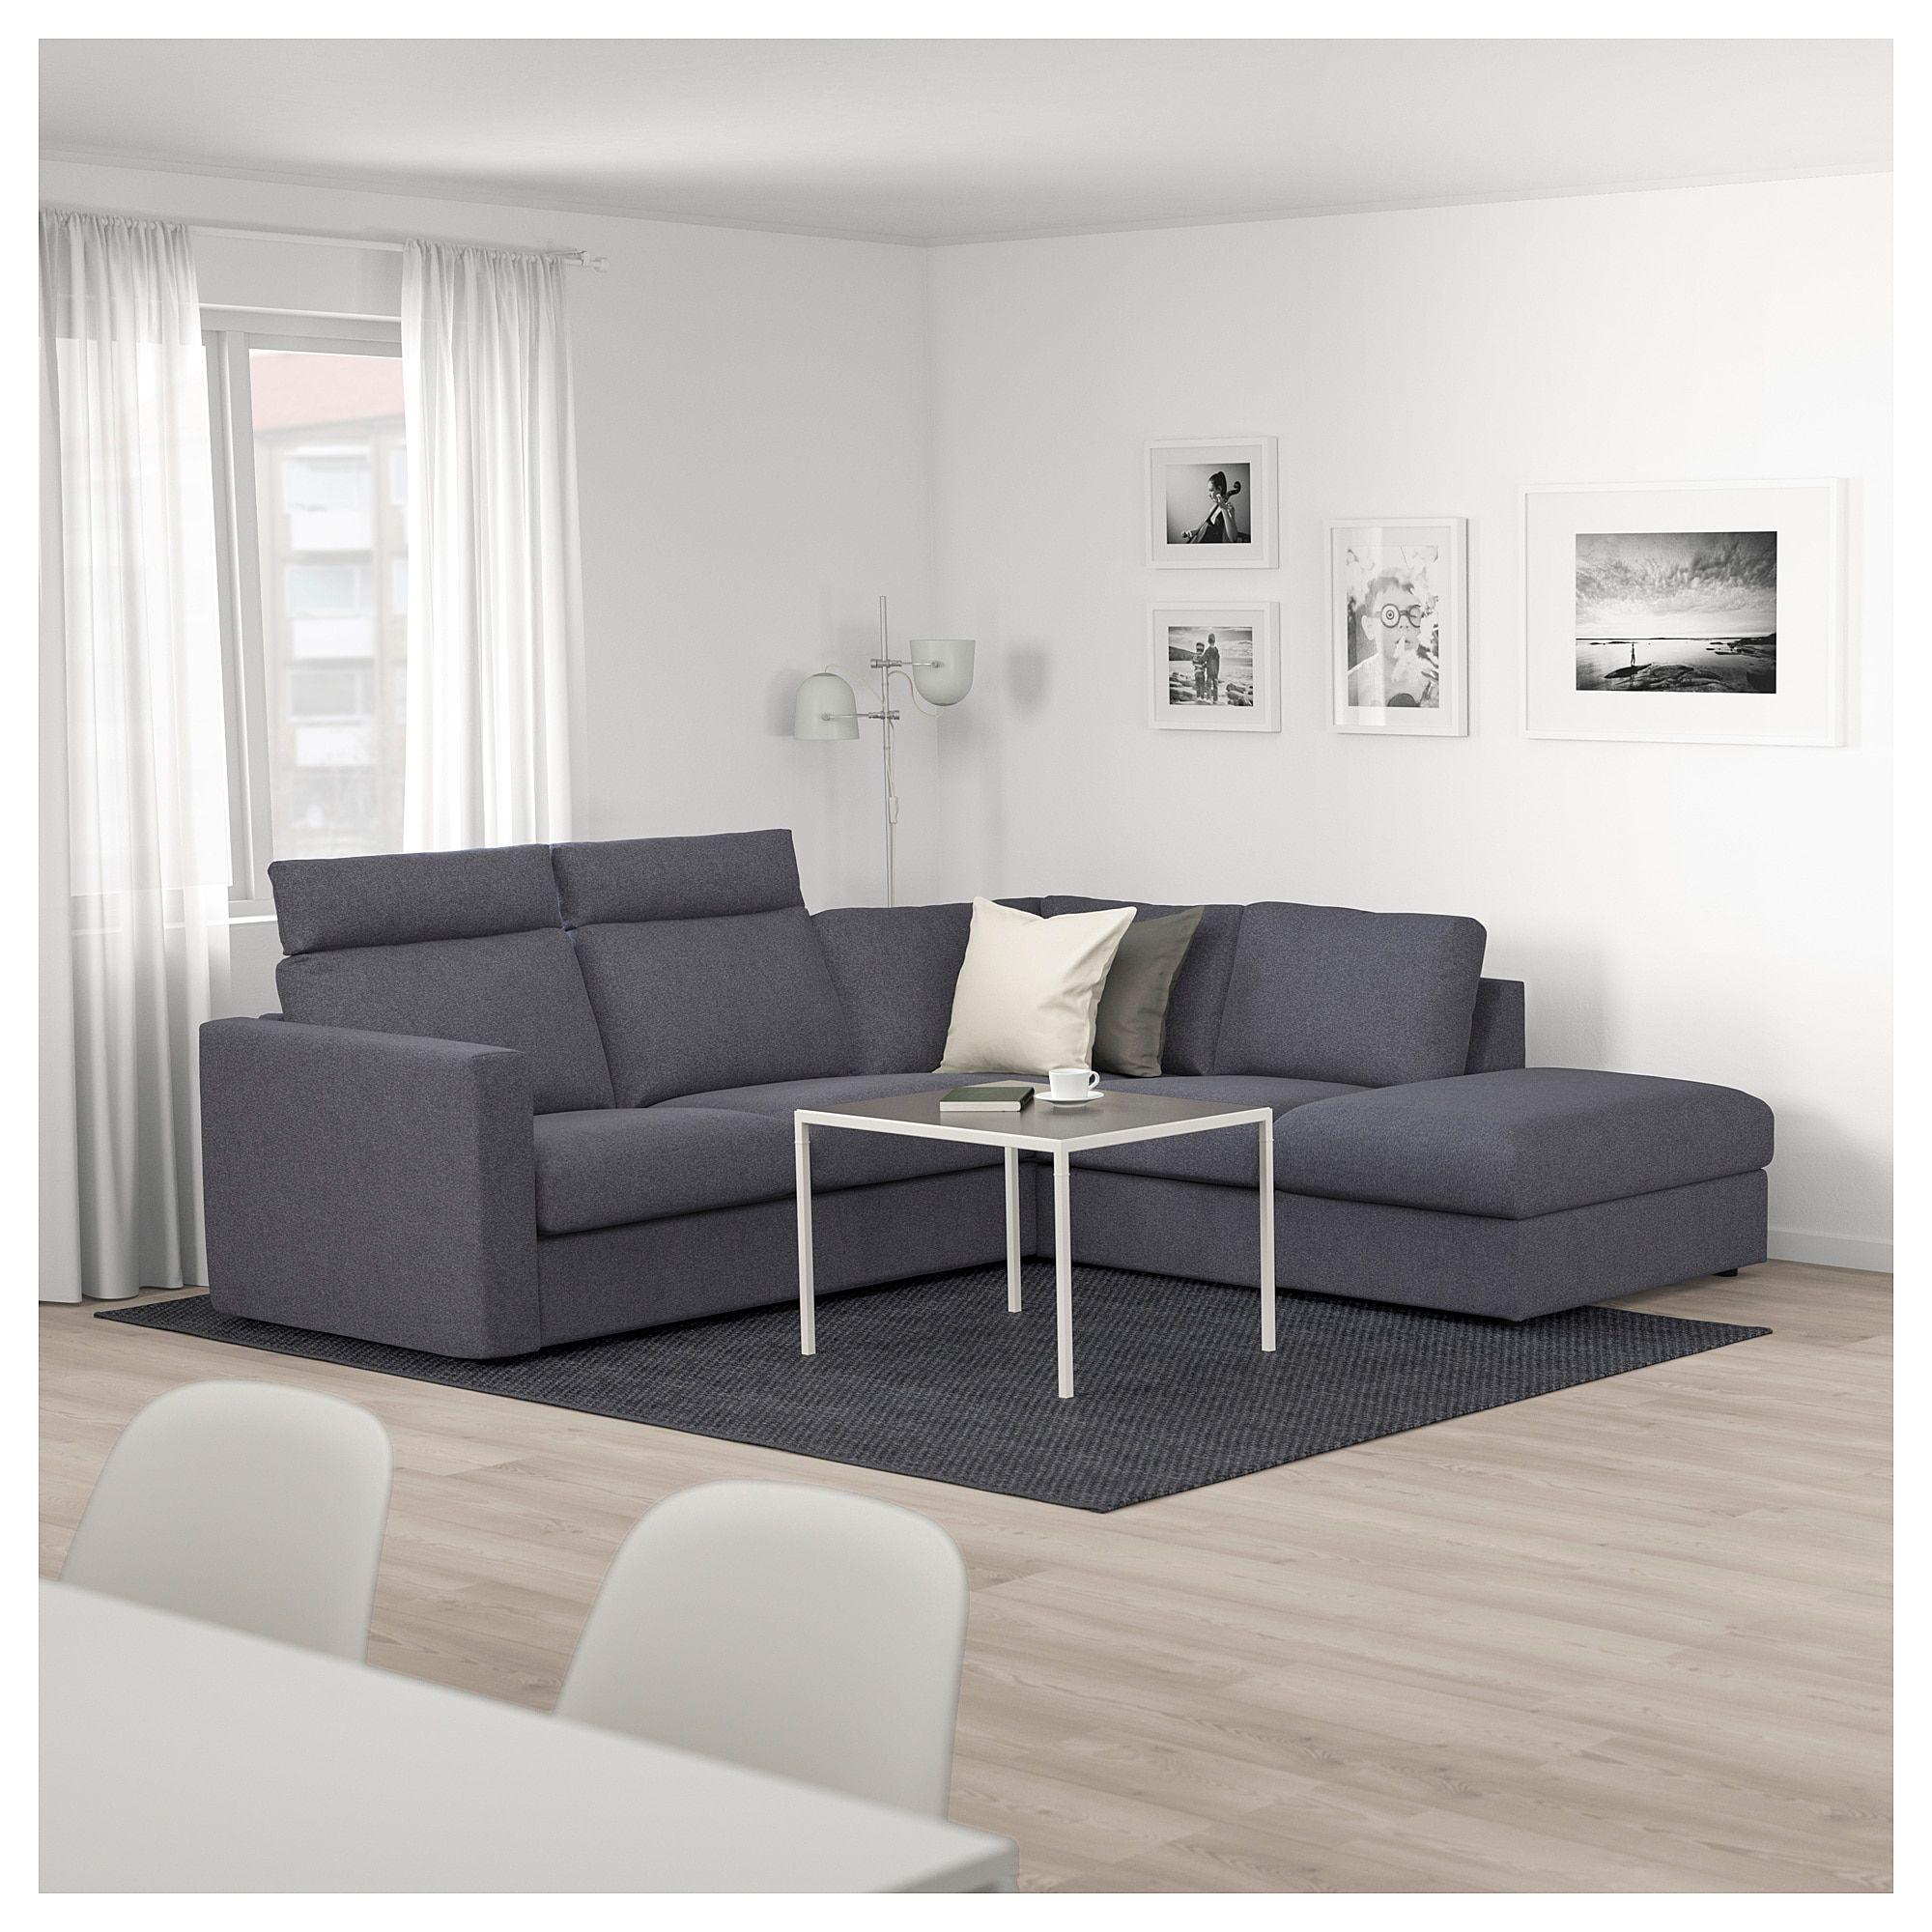 Vimle Canape 3 Places Avec Meridienne Avec Appuie Tete Gunnared Gris Moyen Ikea Ikea Vimle Sofa Modular Corner Sofa Ikea Sofa